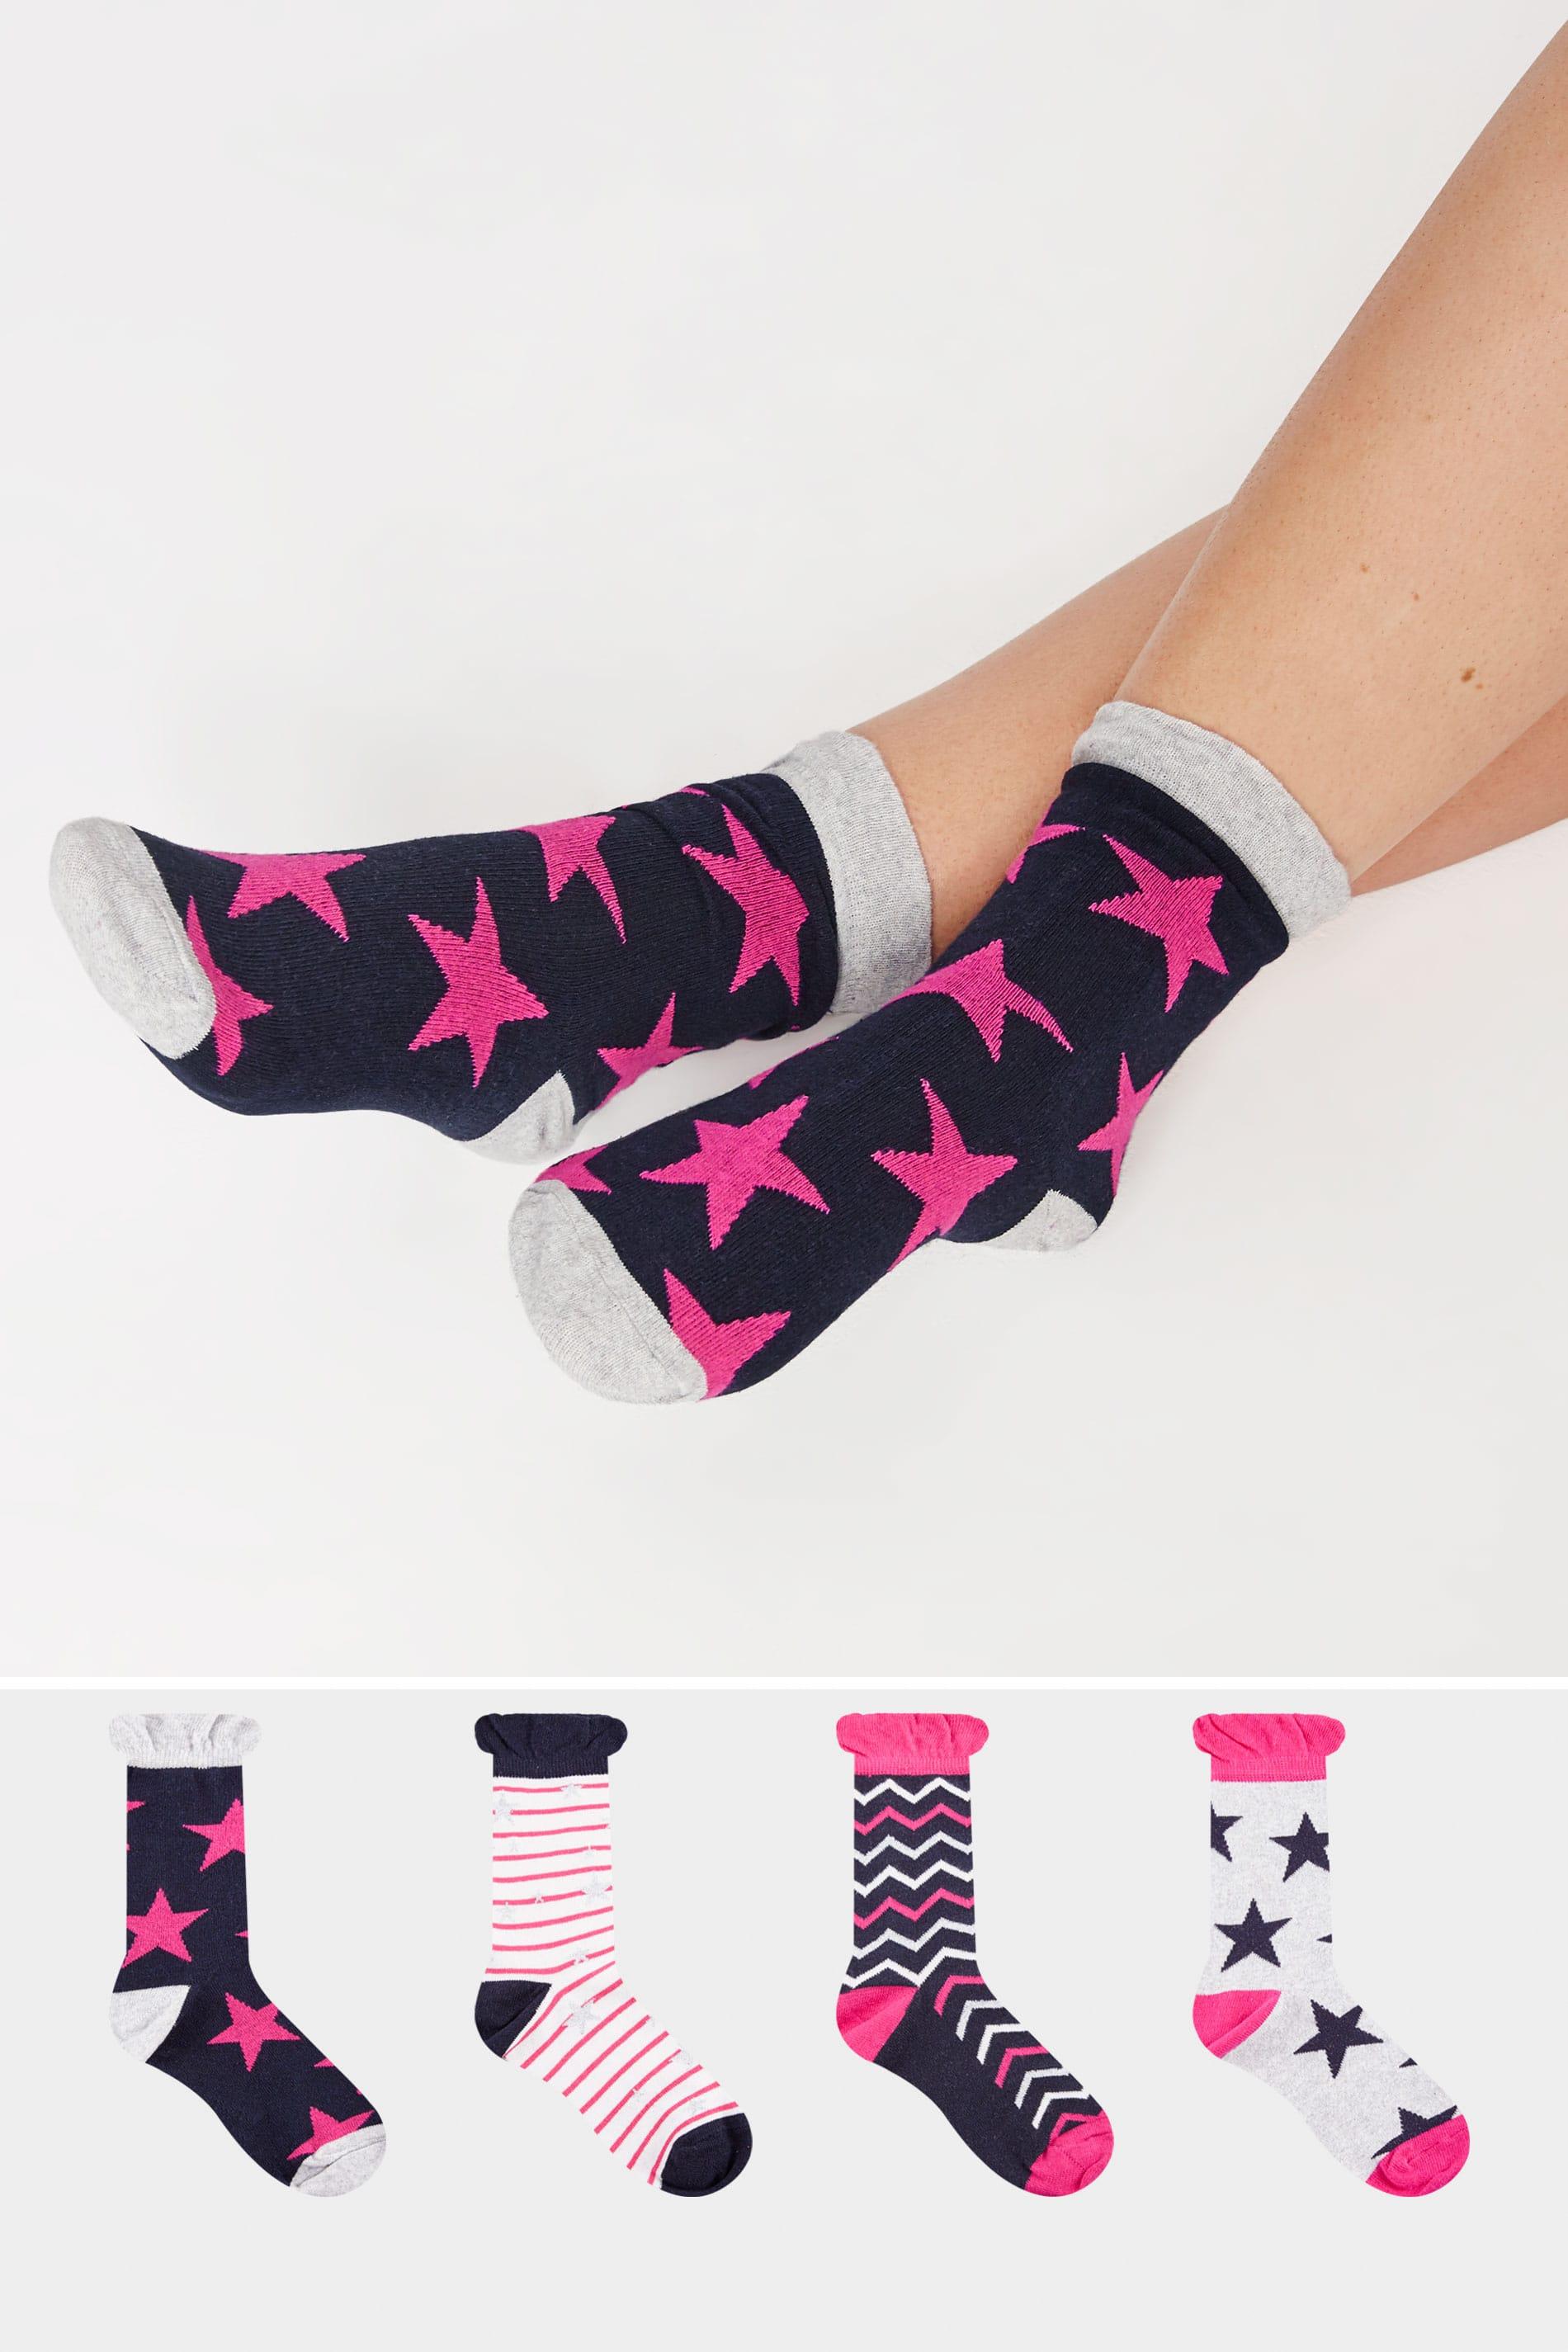 4 PACK Navy Striped & Star Print Ankle Socks